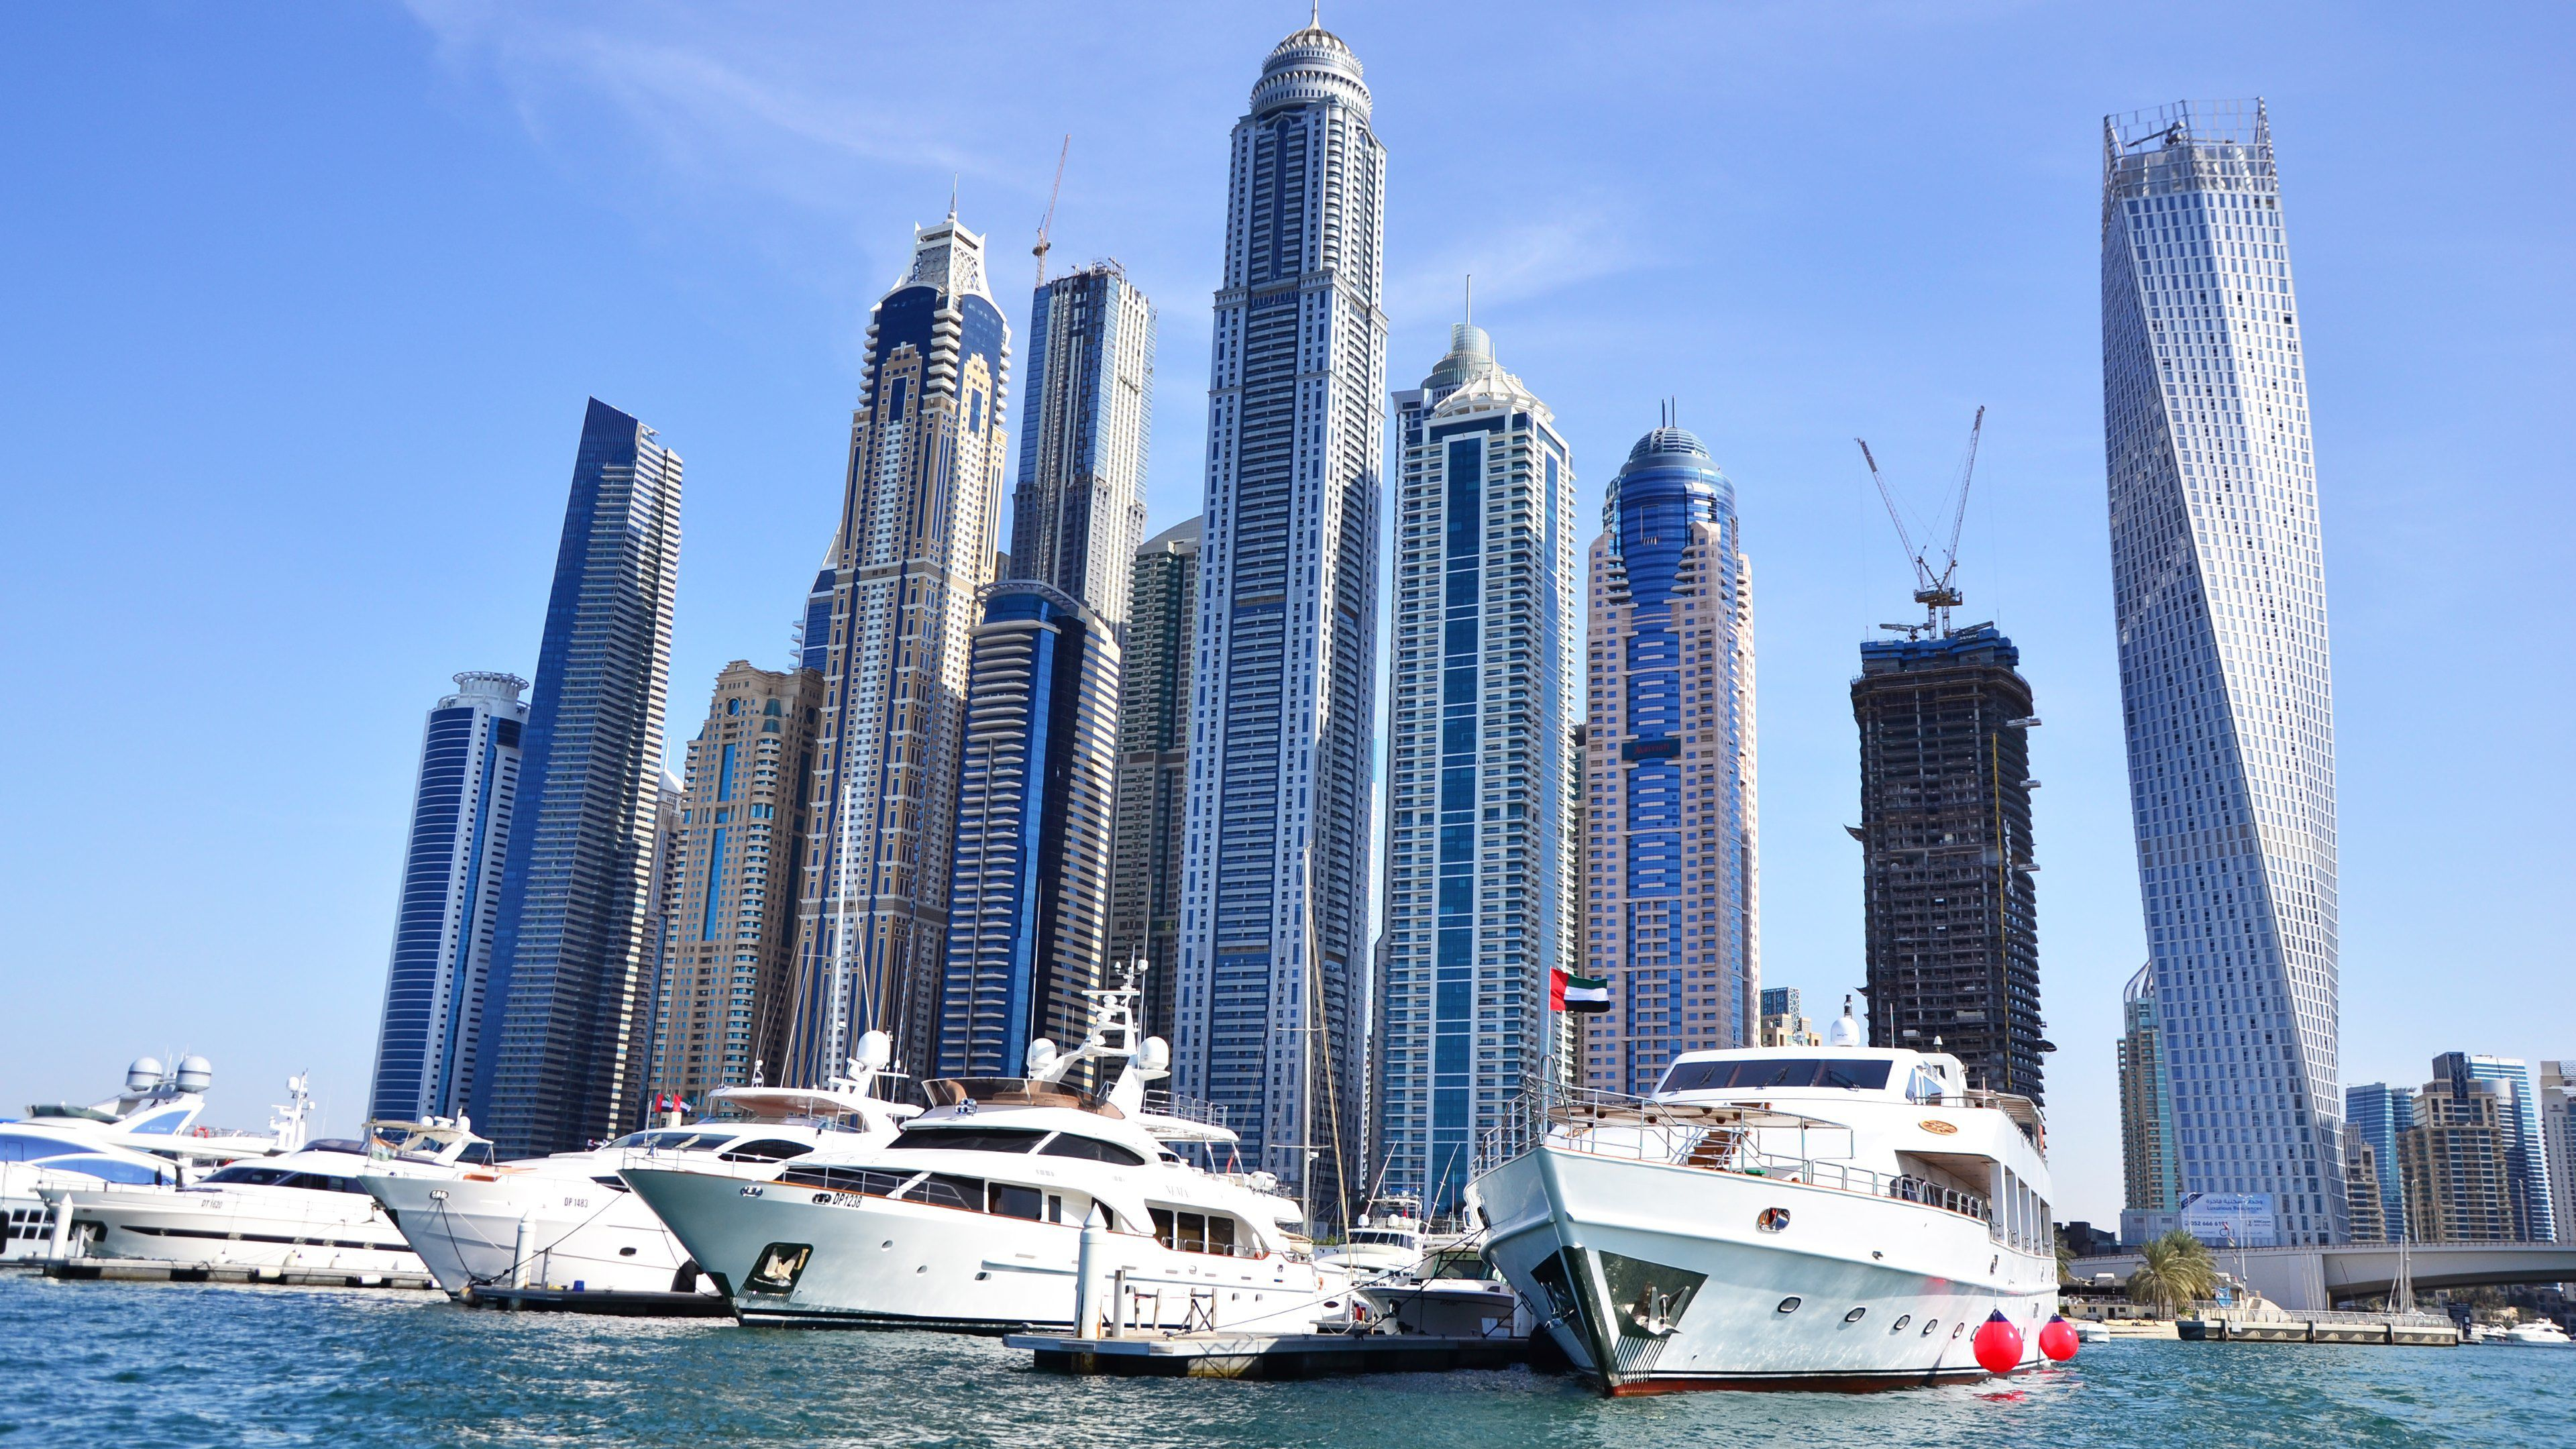 Dubai wallpapers and photos 4k full hd everes hill - Wallpaper hd 4k ...